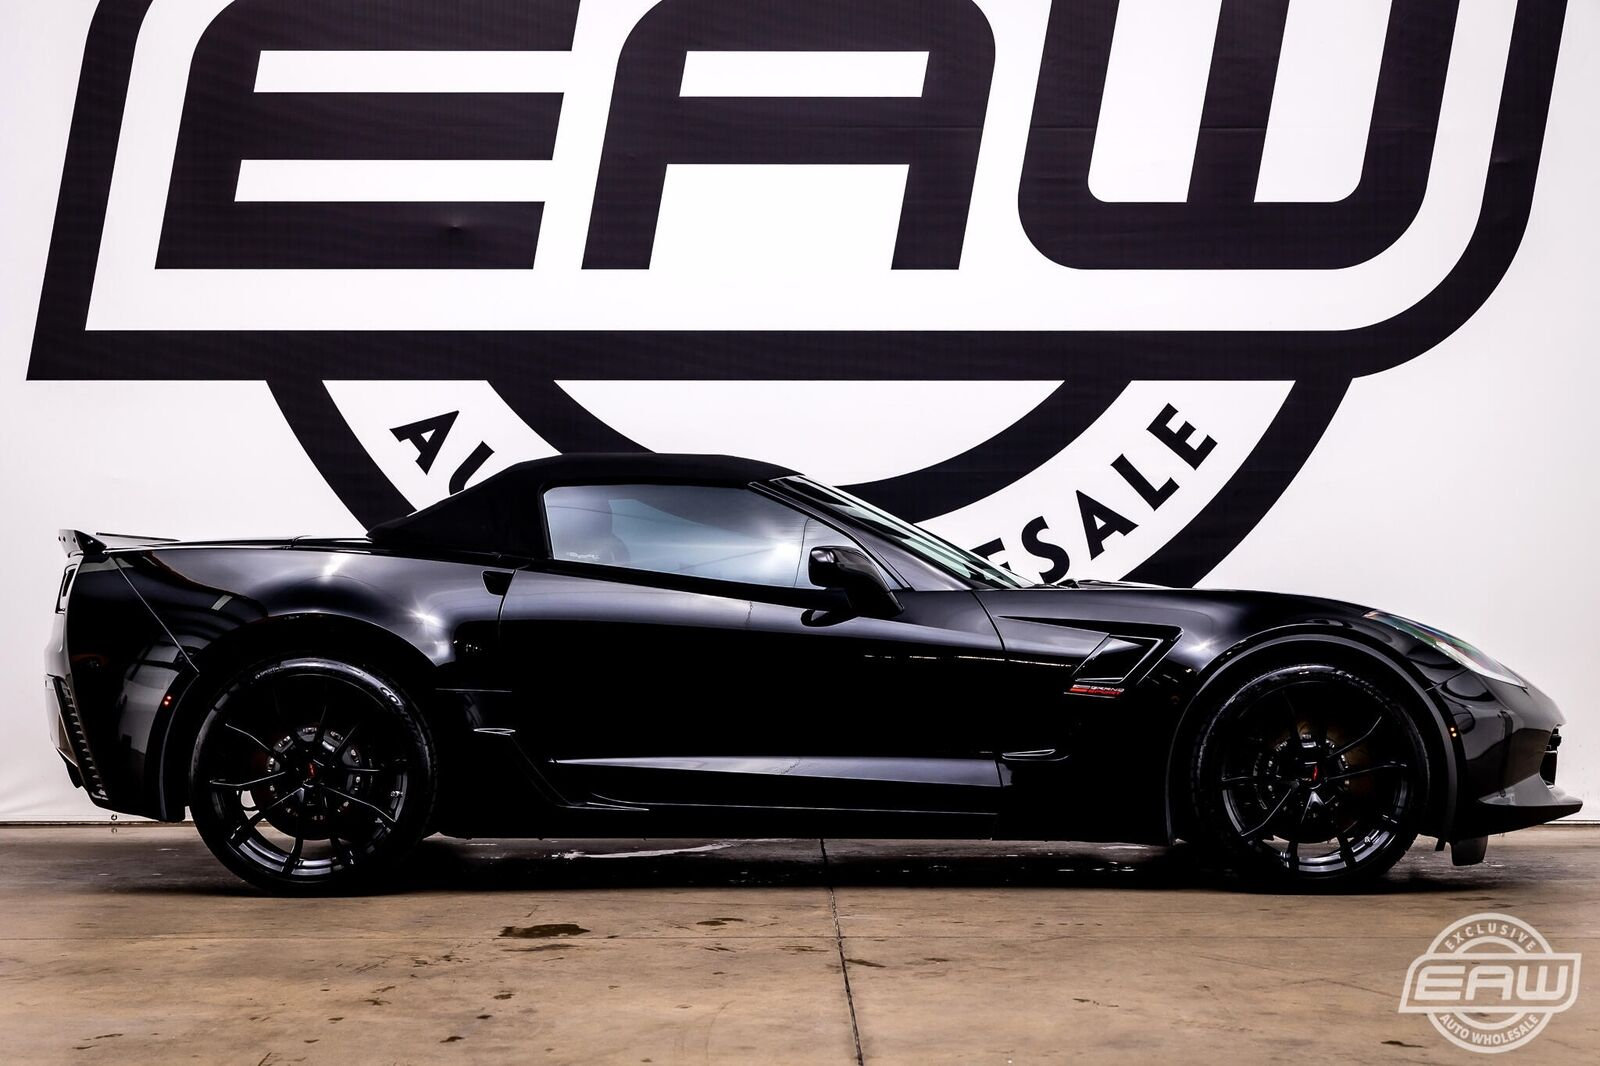 2019 Black Chevrolet Corvette Convertible 2LT | C7 Corvette Photo 9